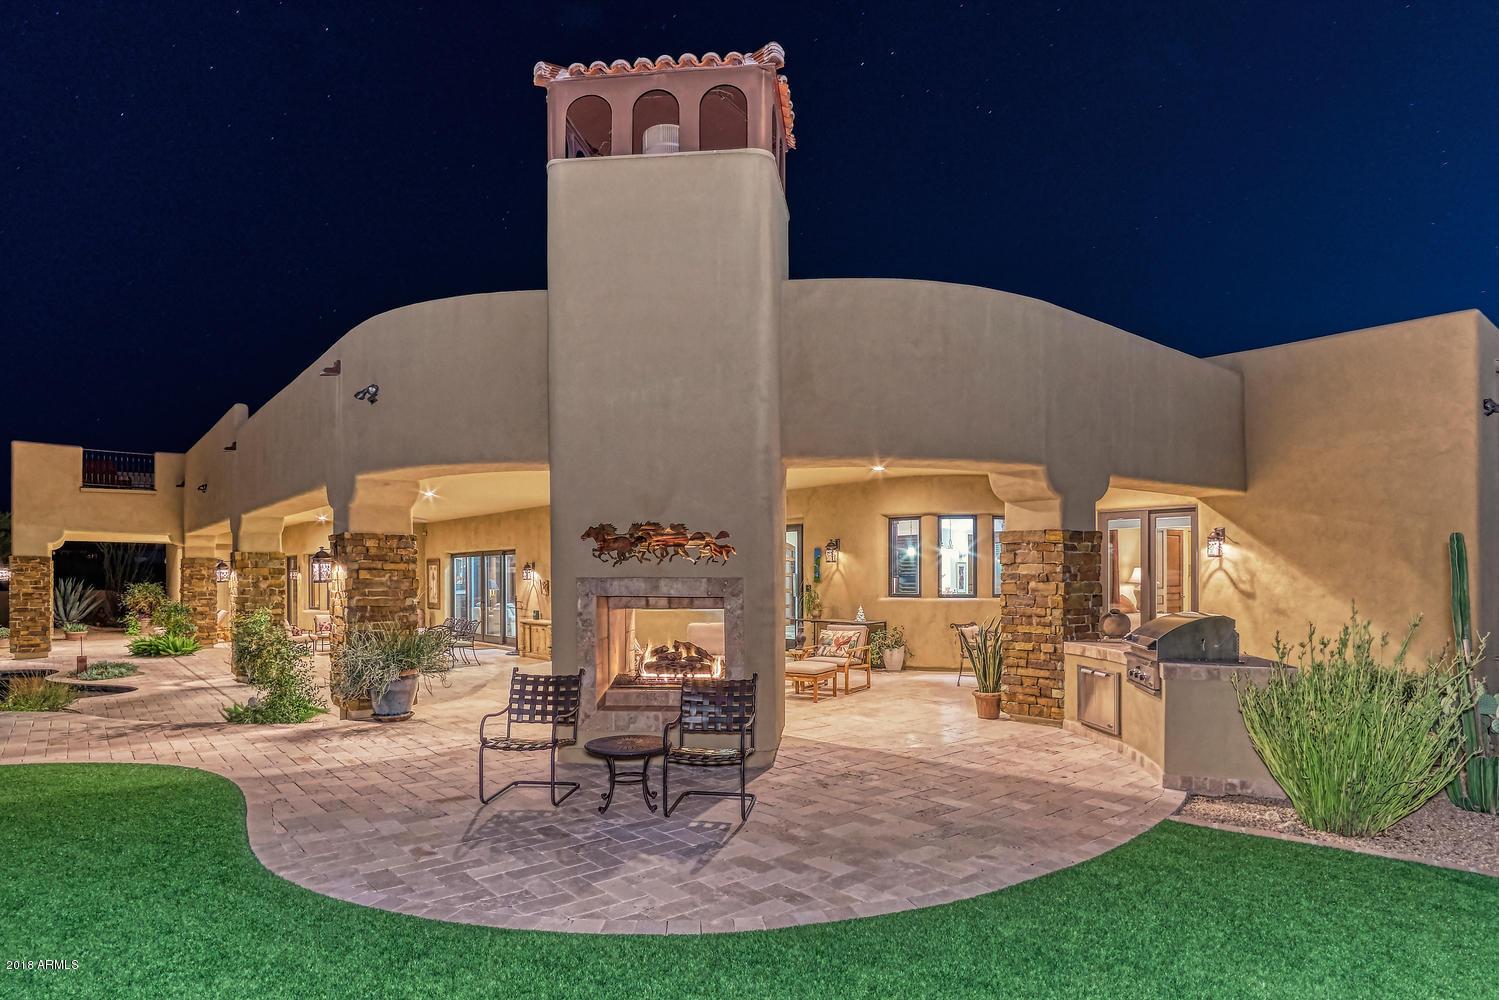 Photo of 8498 E NIGHTINGALE STAR Drive, Scottsdale, AZ 85266